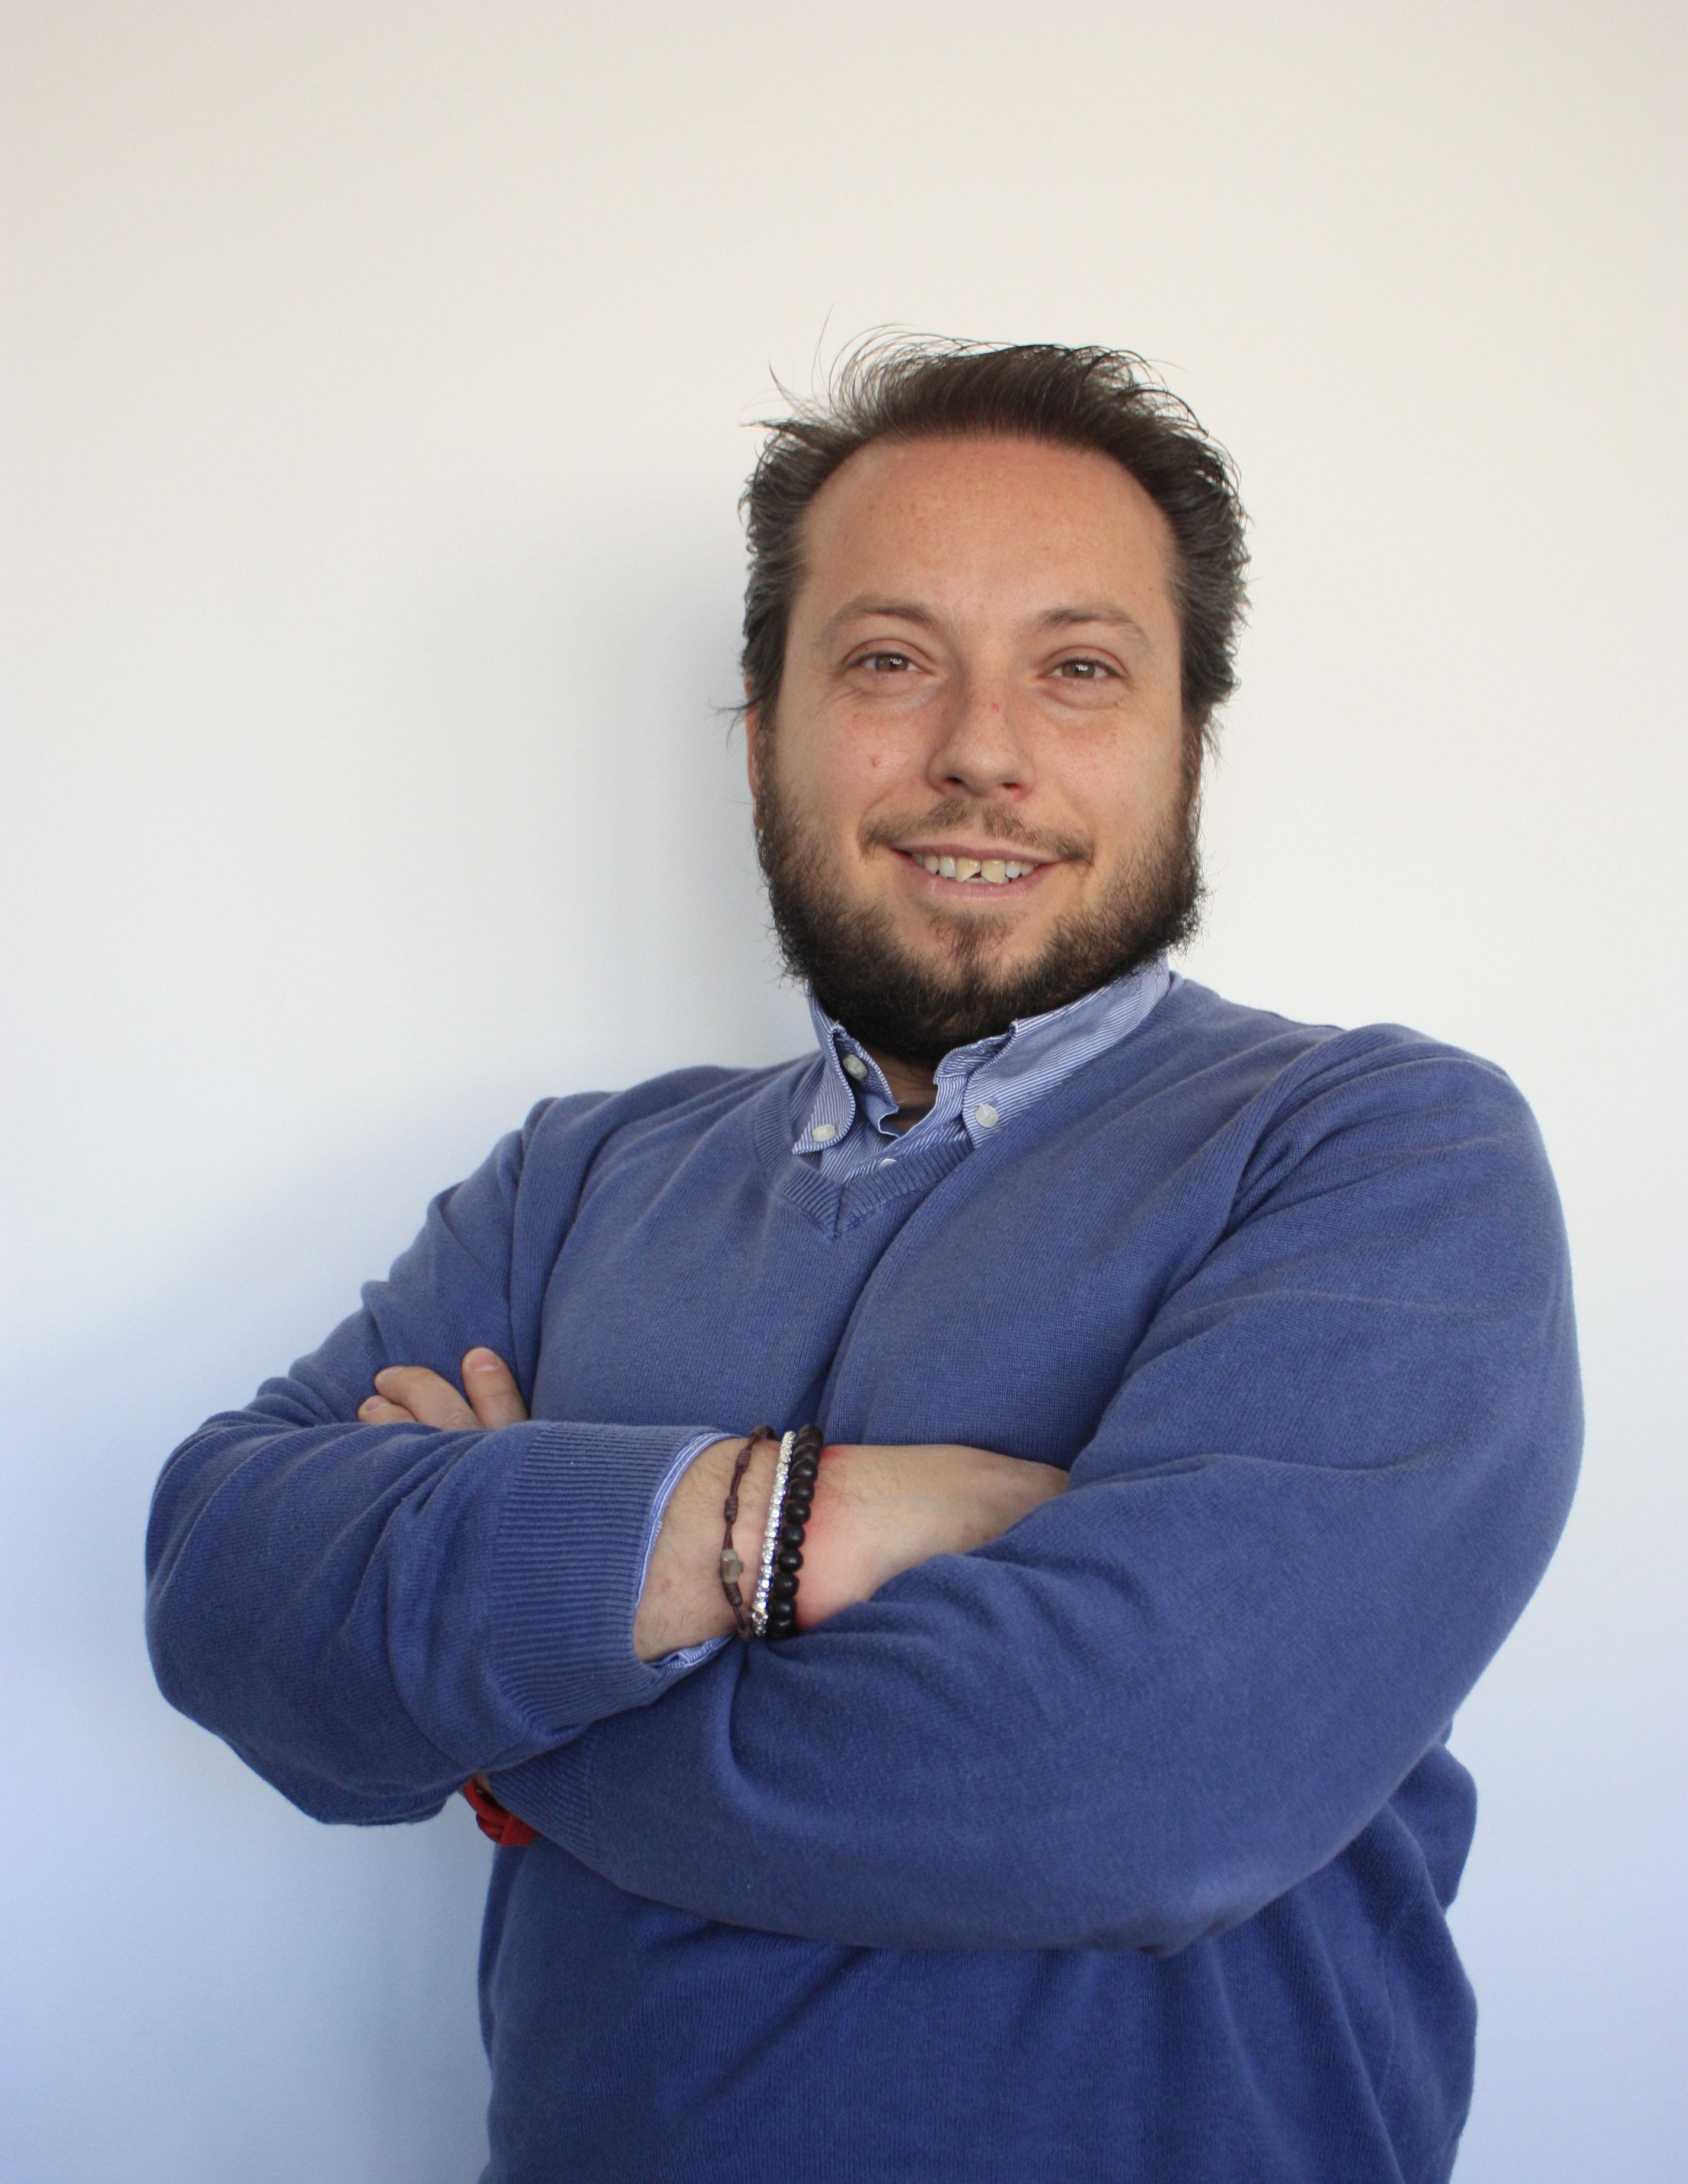 Bruno Varacalli